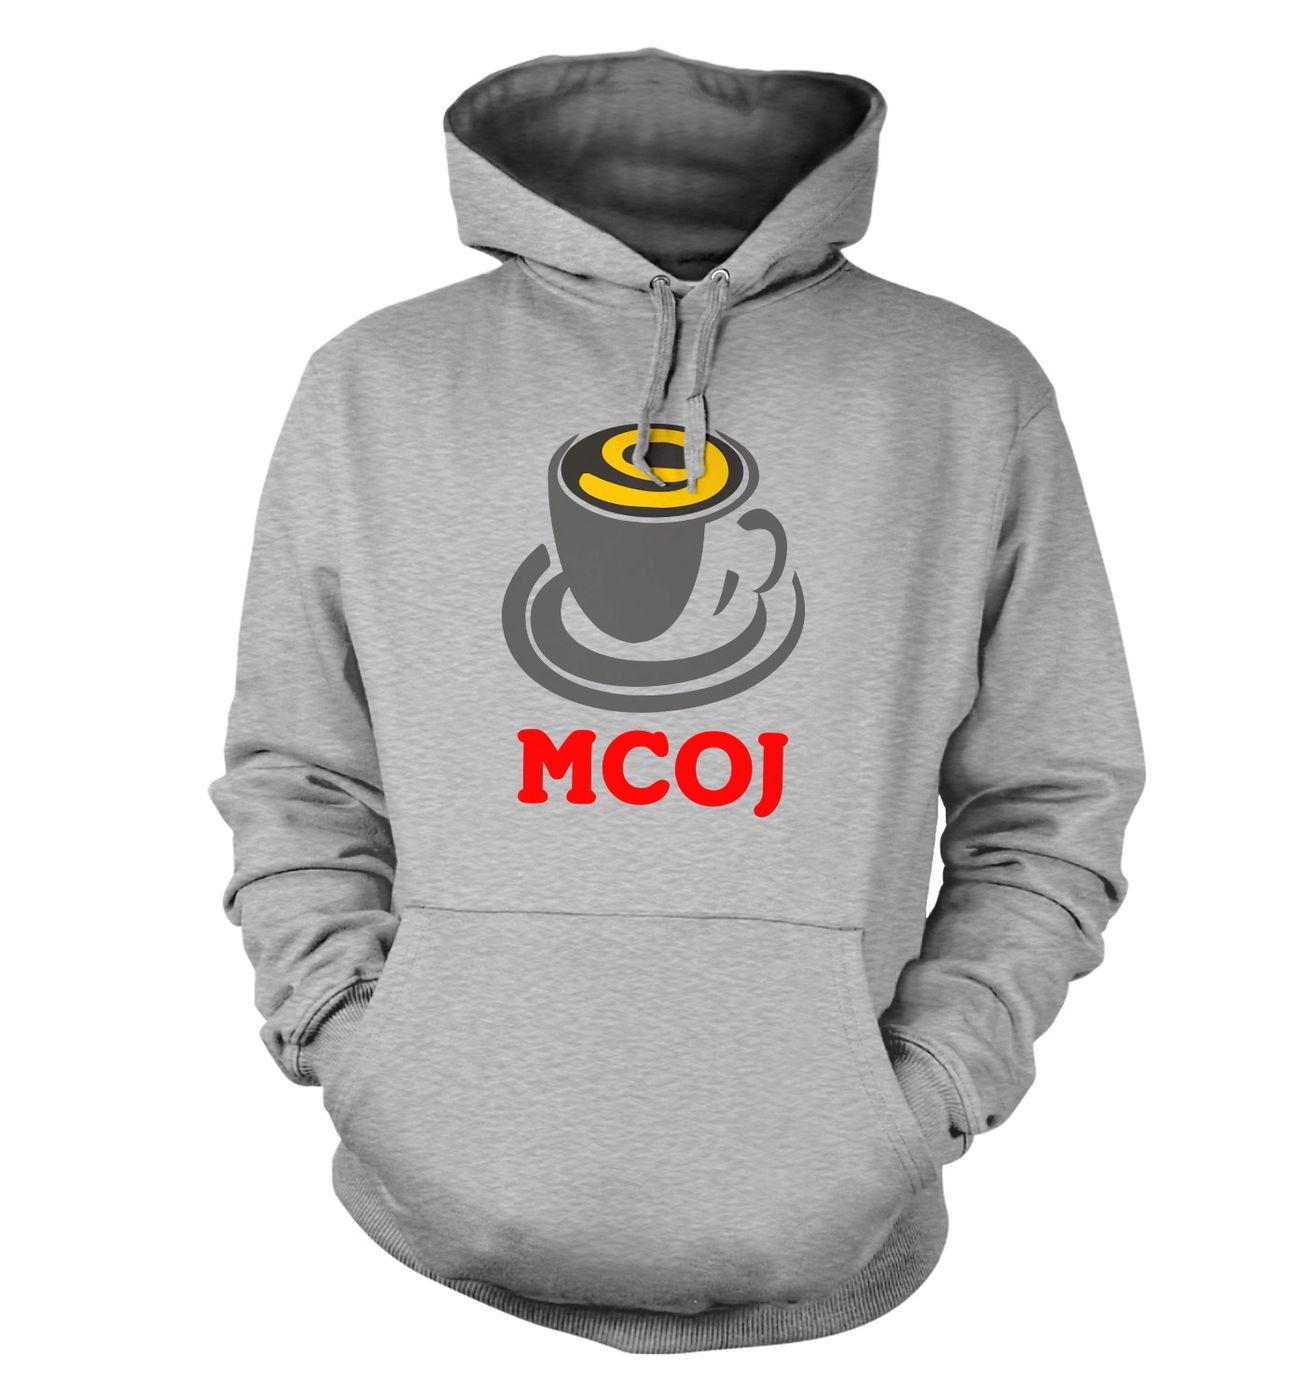 MobileCupOfJoe hoodie - MCOJ logo